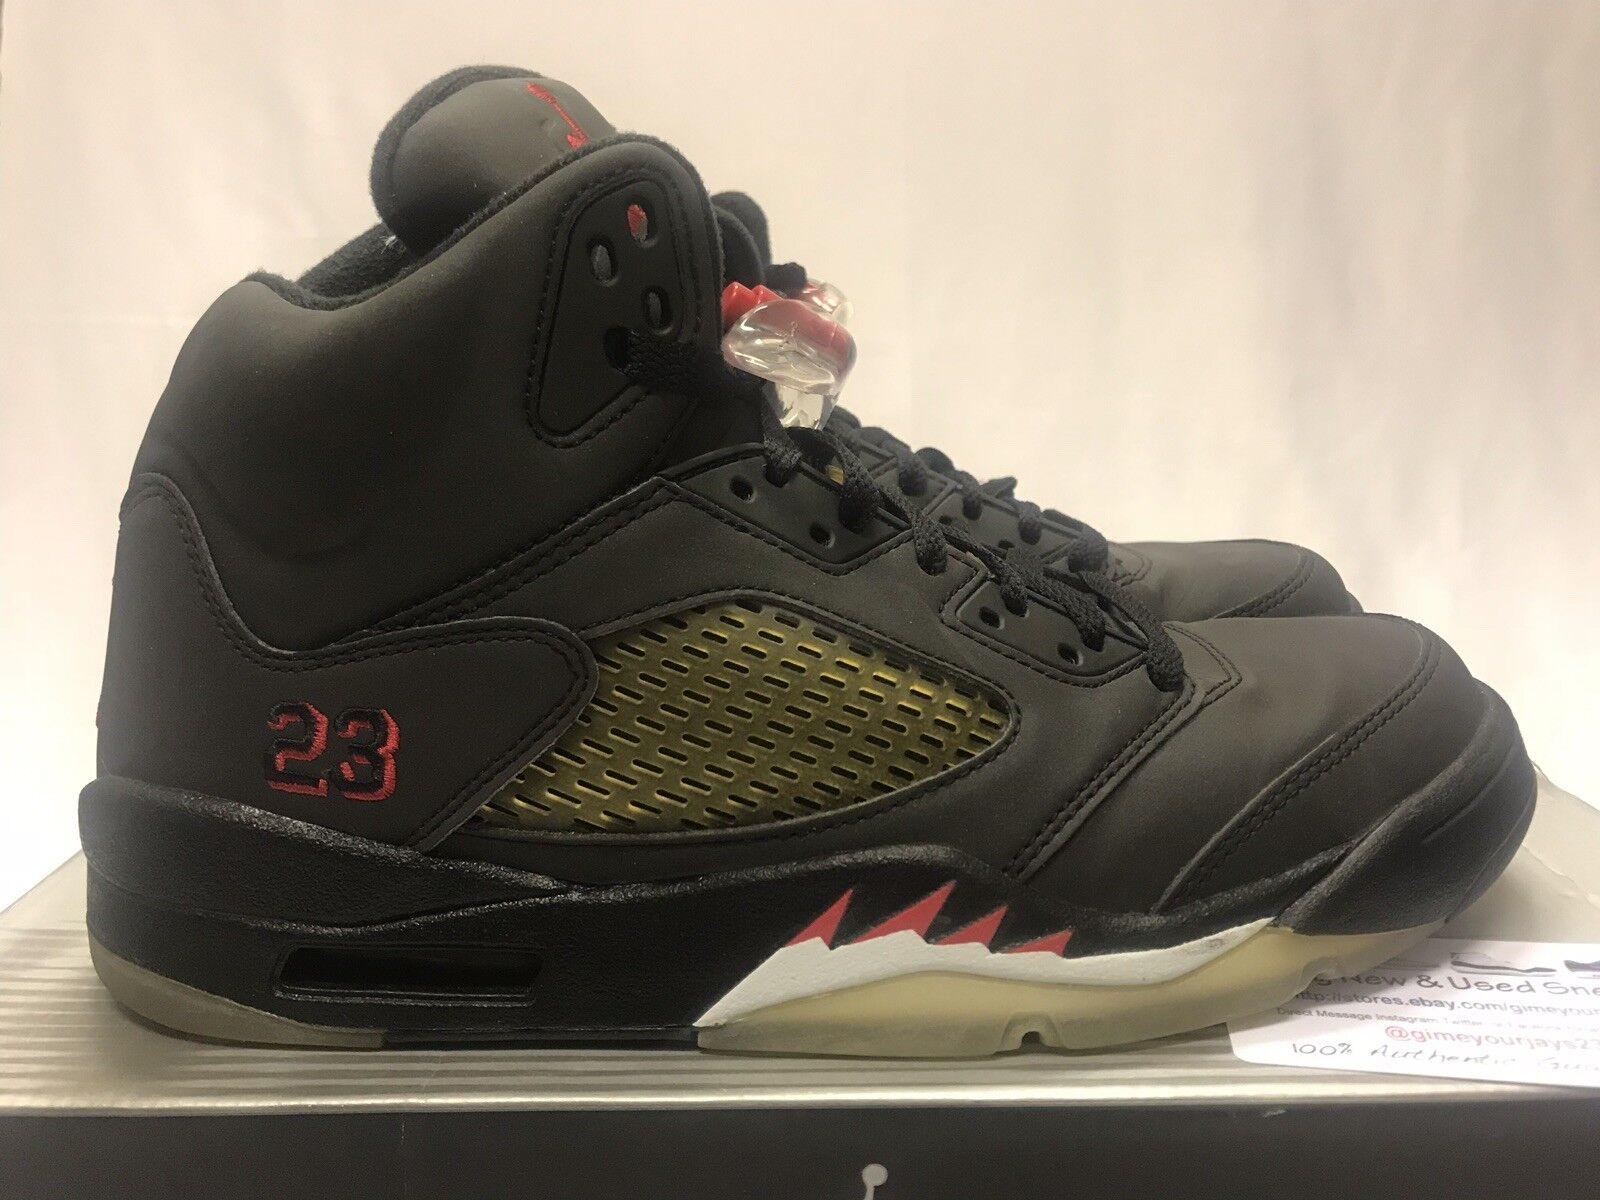 cheap for discount b6f97 d9687 Jordan Jordan Jordan retrò dmp   5  41